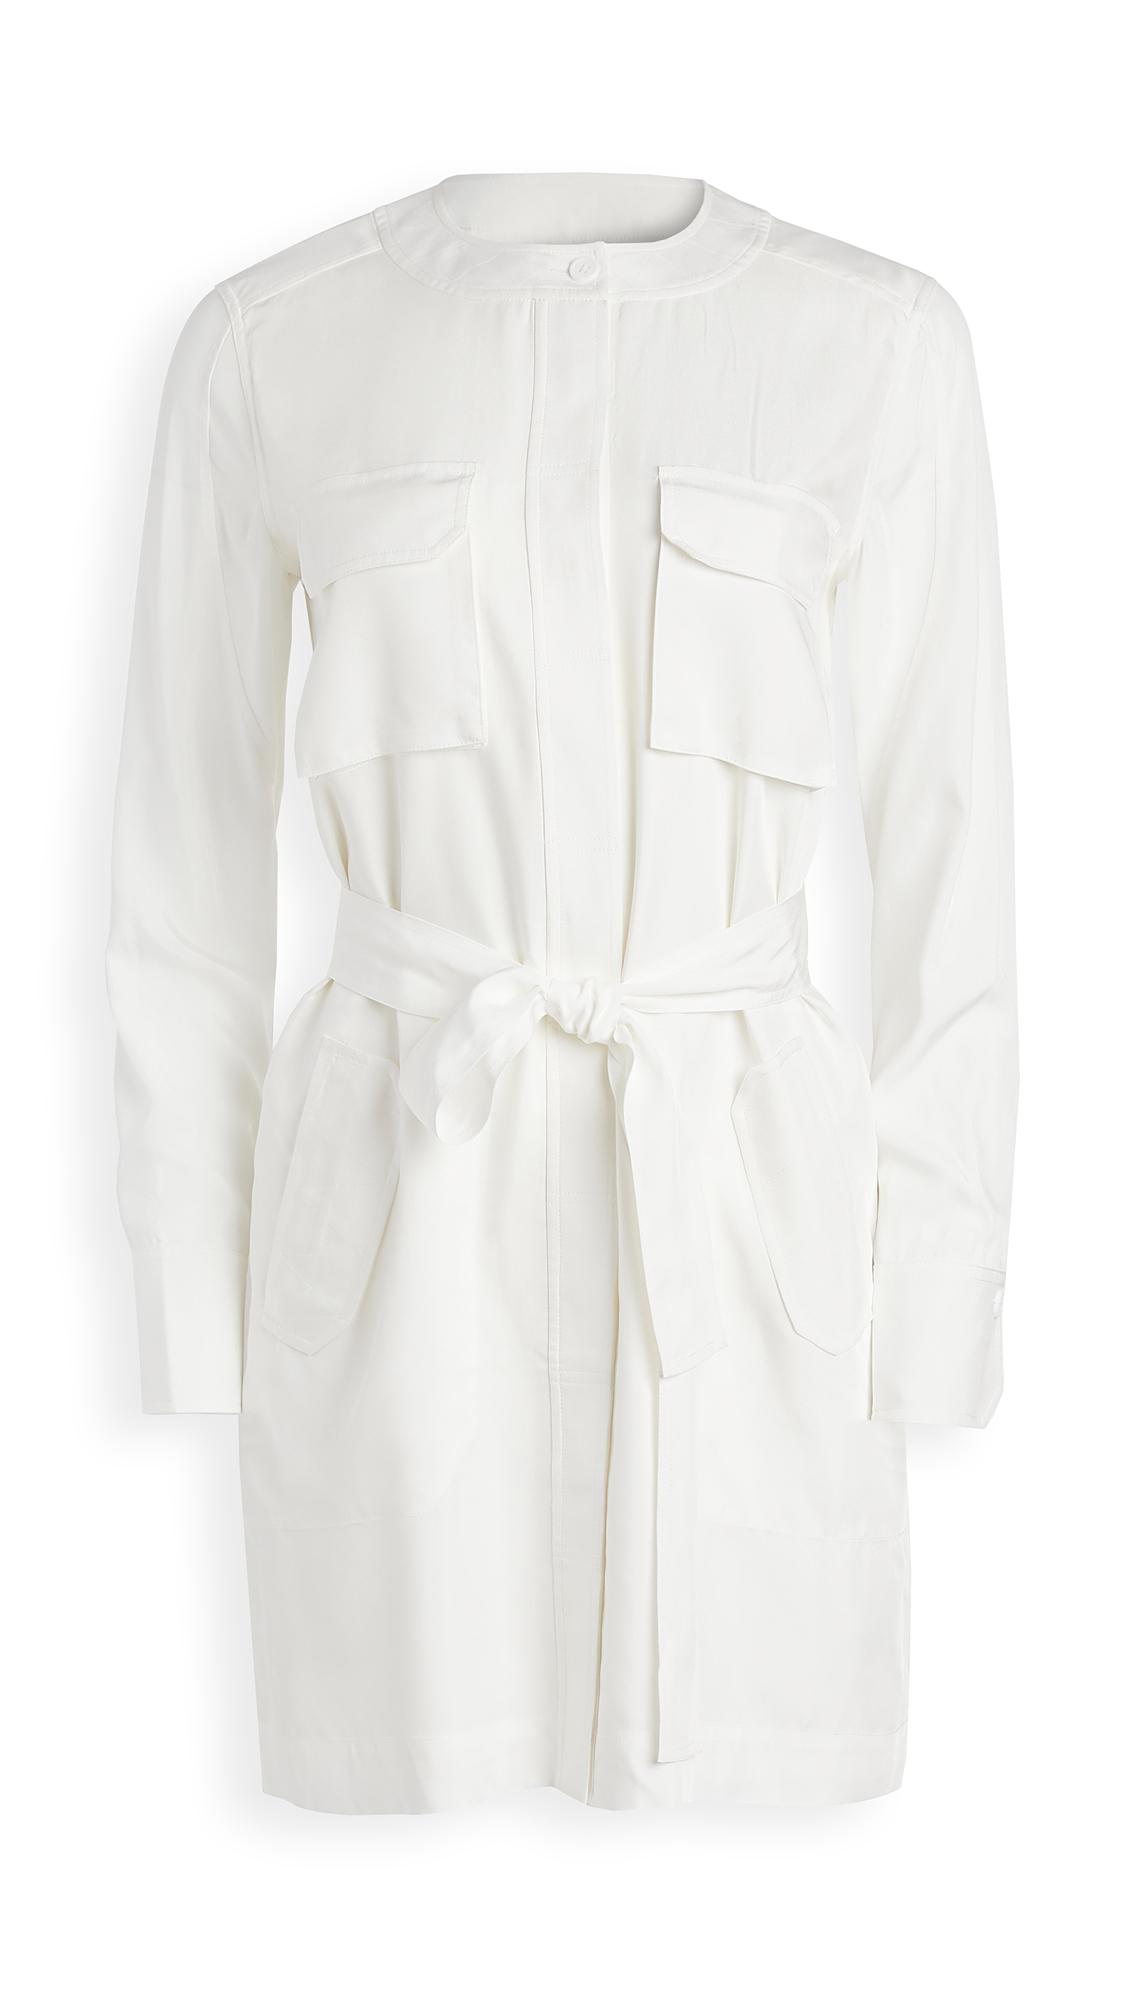 Equipment Addeve Dress - 40% Off Sale